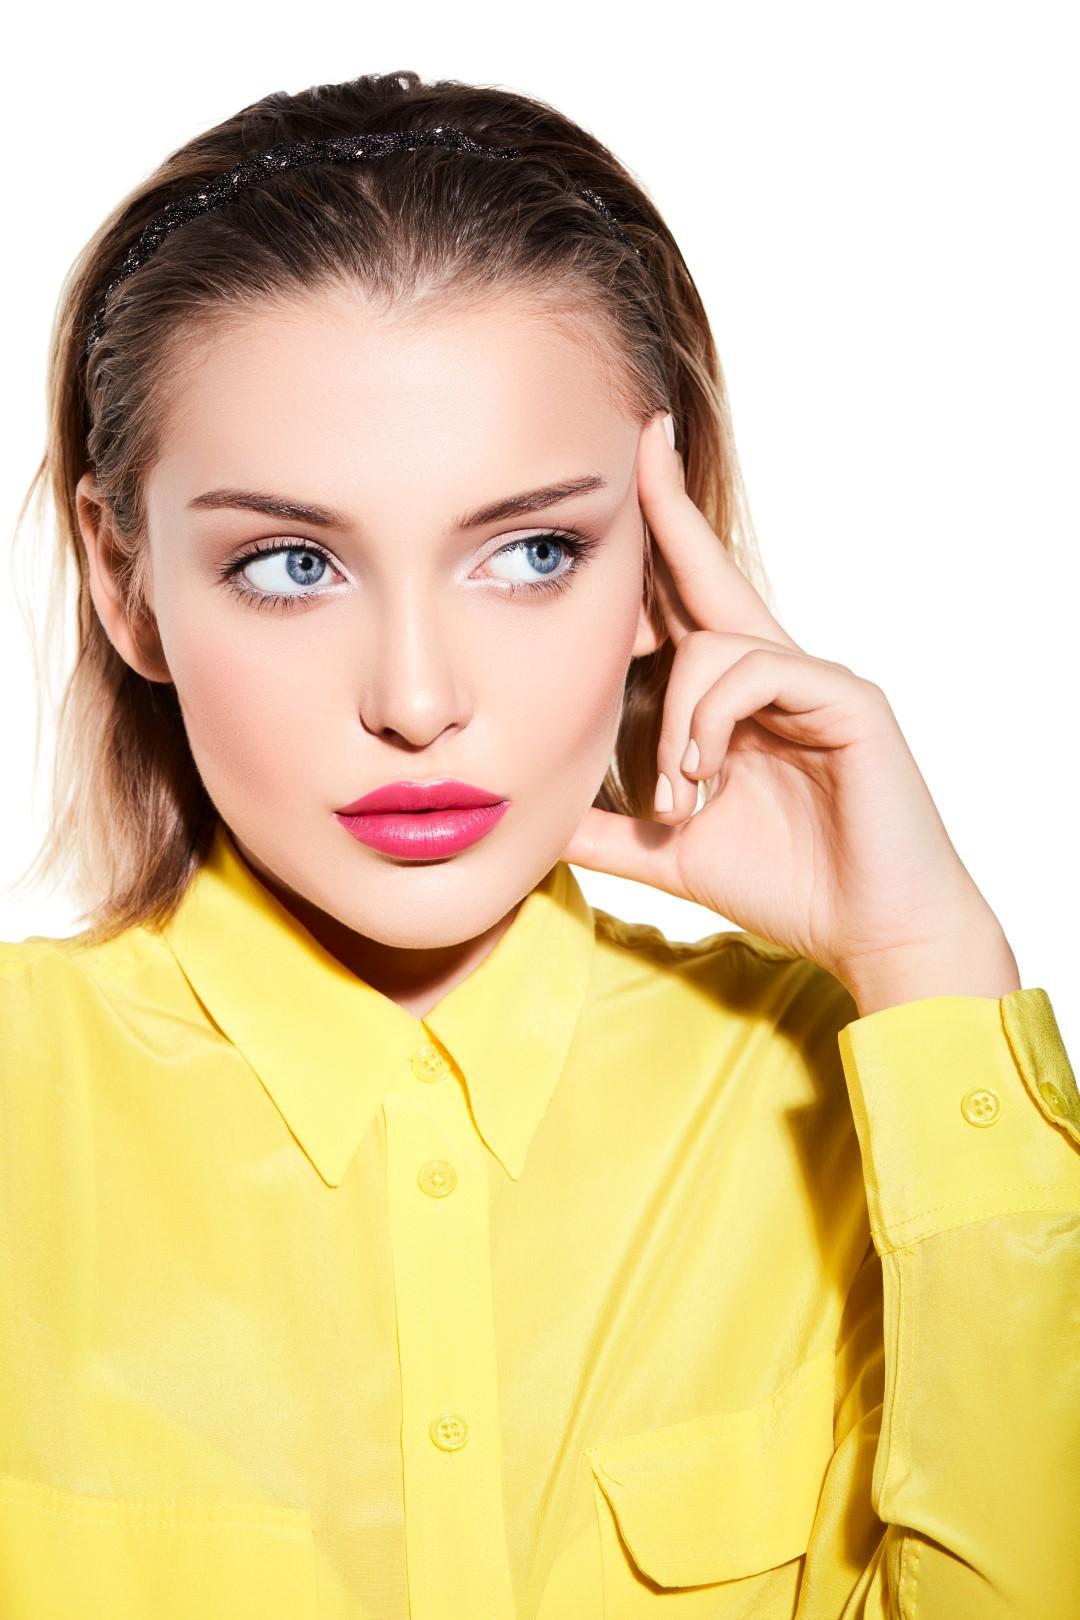 Визажист хомякова, ирина хомякова, Школа макияжа, курсы макияжа, мейкакп сопровождение